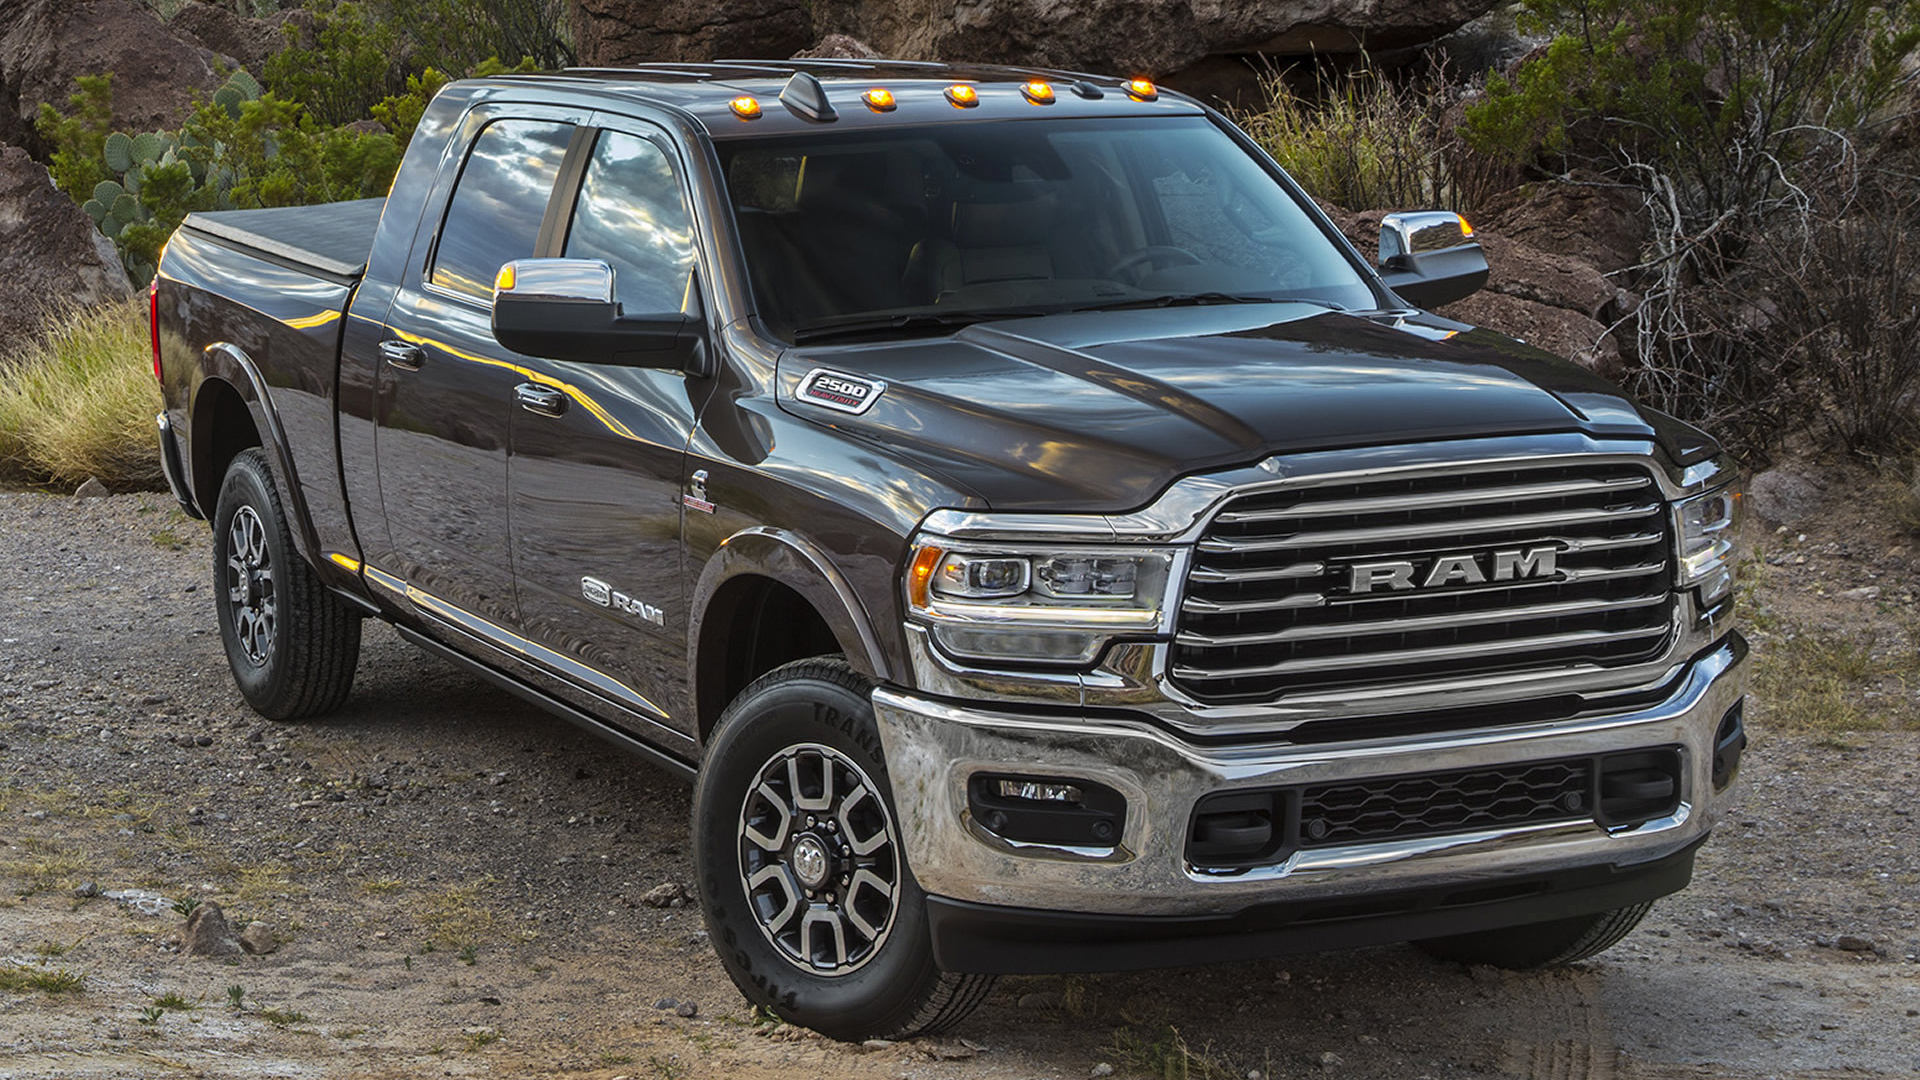 Toyota Of Laramie >> 2019 Ram 2500 Longhorn Mega Cab - Wallpapers and HD Images   Car Pixel